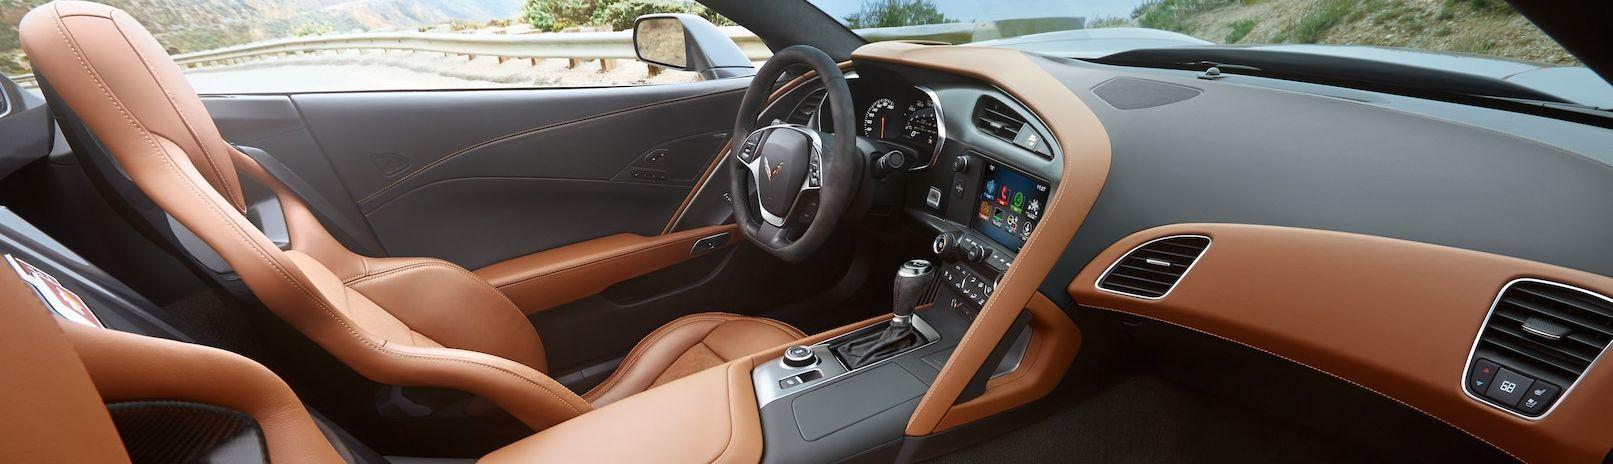 Interior of the 2019 Chevy Corvette